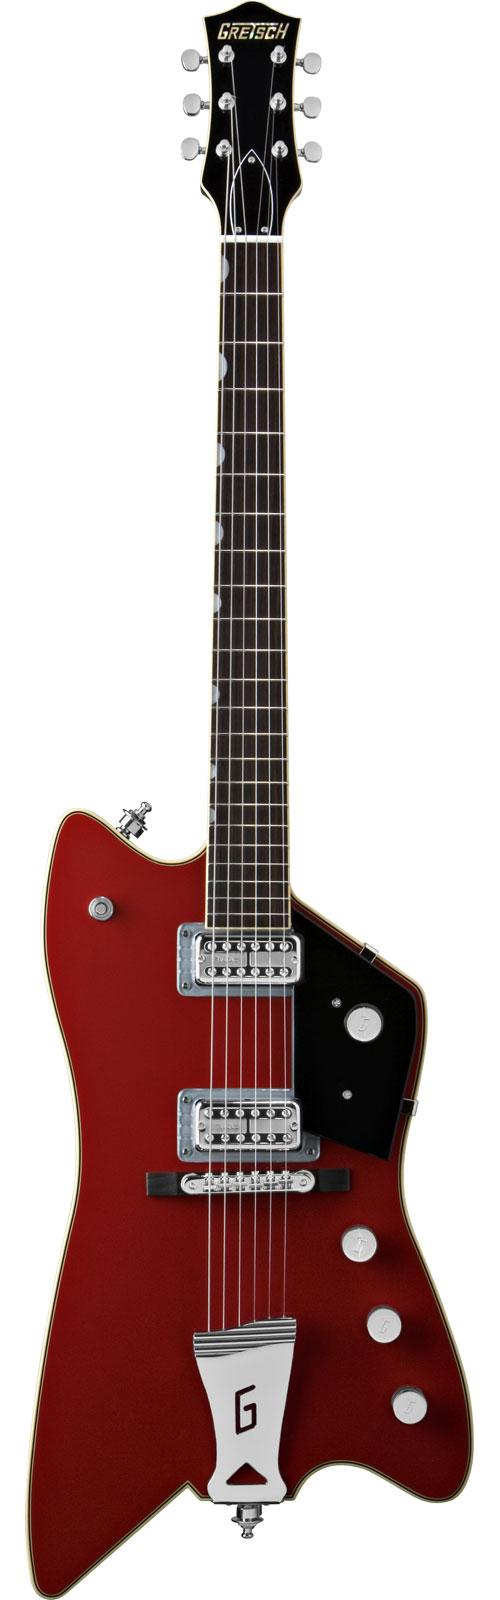 Gretsch Billy-bo Jupiter Thunderbird Tv Jones Power'tron Firebird Red + Etui